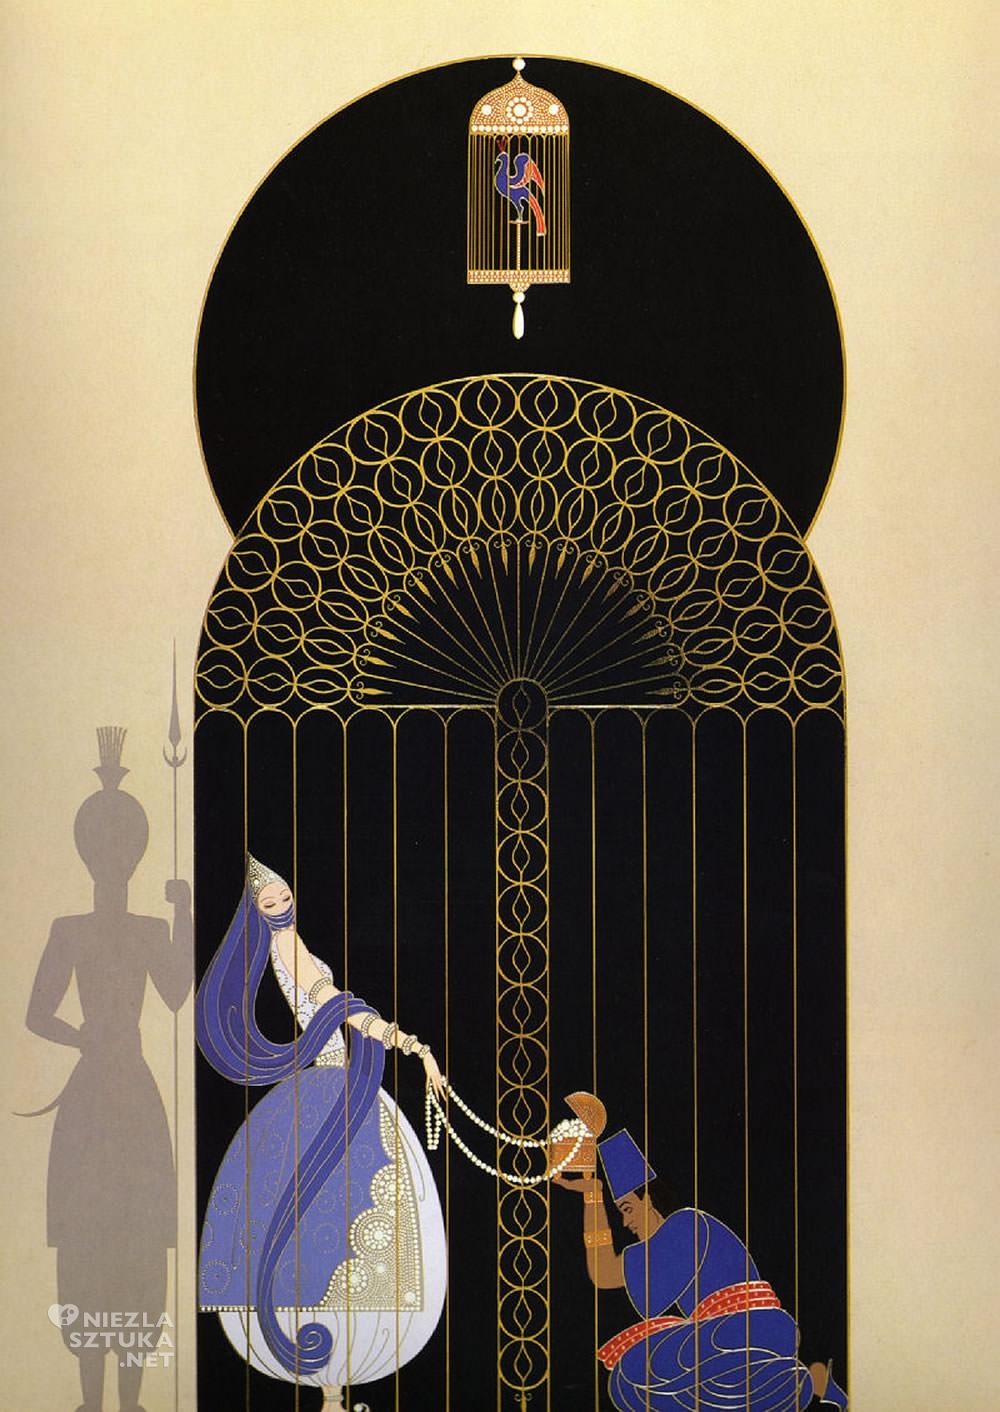 Erté, Ptak w klatce, Romain de Tirtoff, moda, grafika, ilustracja, Niezła Sztuka